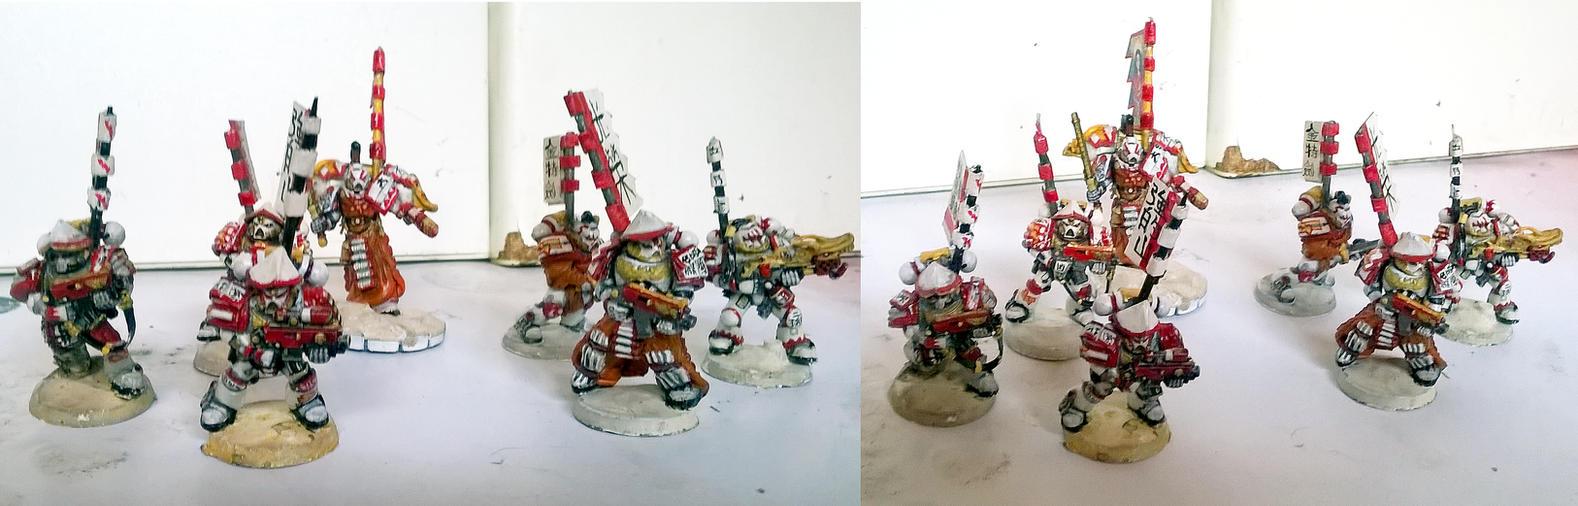 Susegasa Samurai White Scars by orcbruto